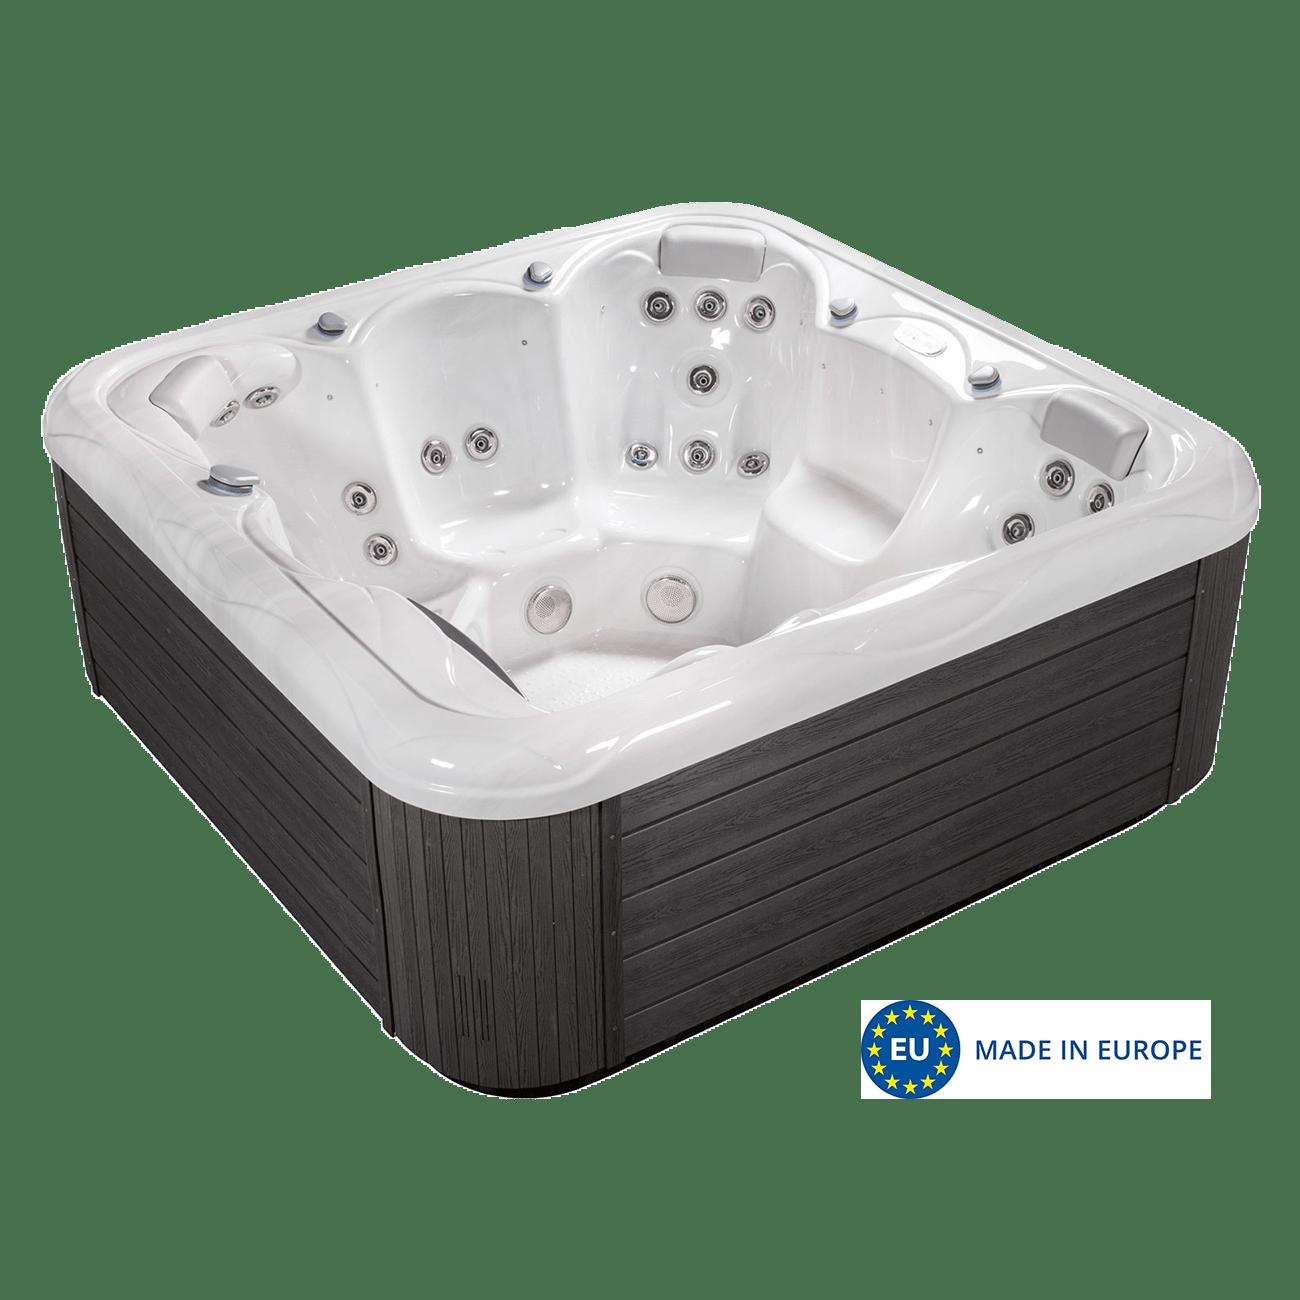 Top-Angebot: Whirlpool FlexLine Rhodos